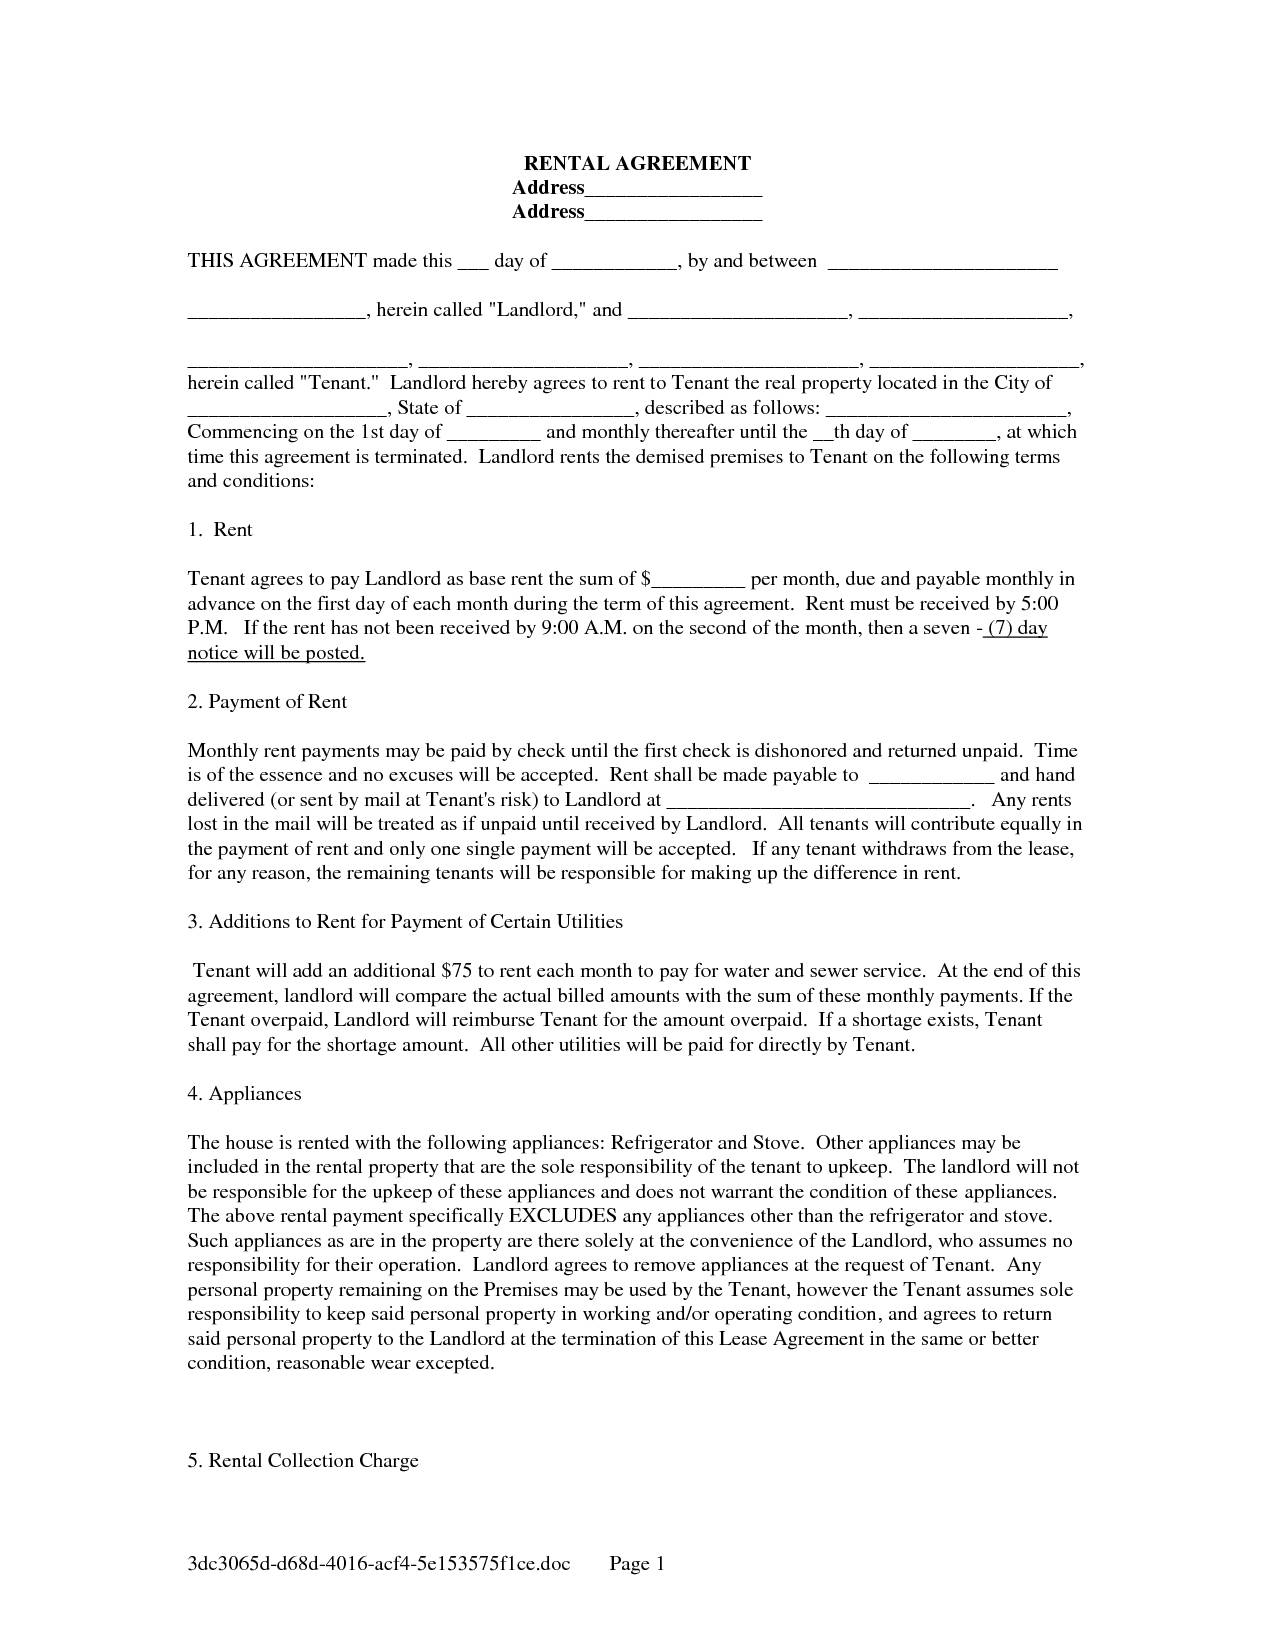 Land Rental Agreement Forms